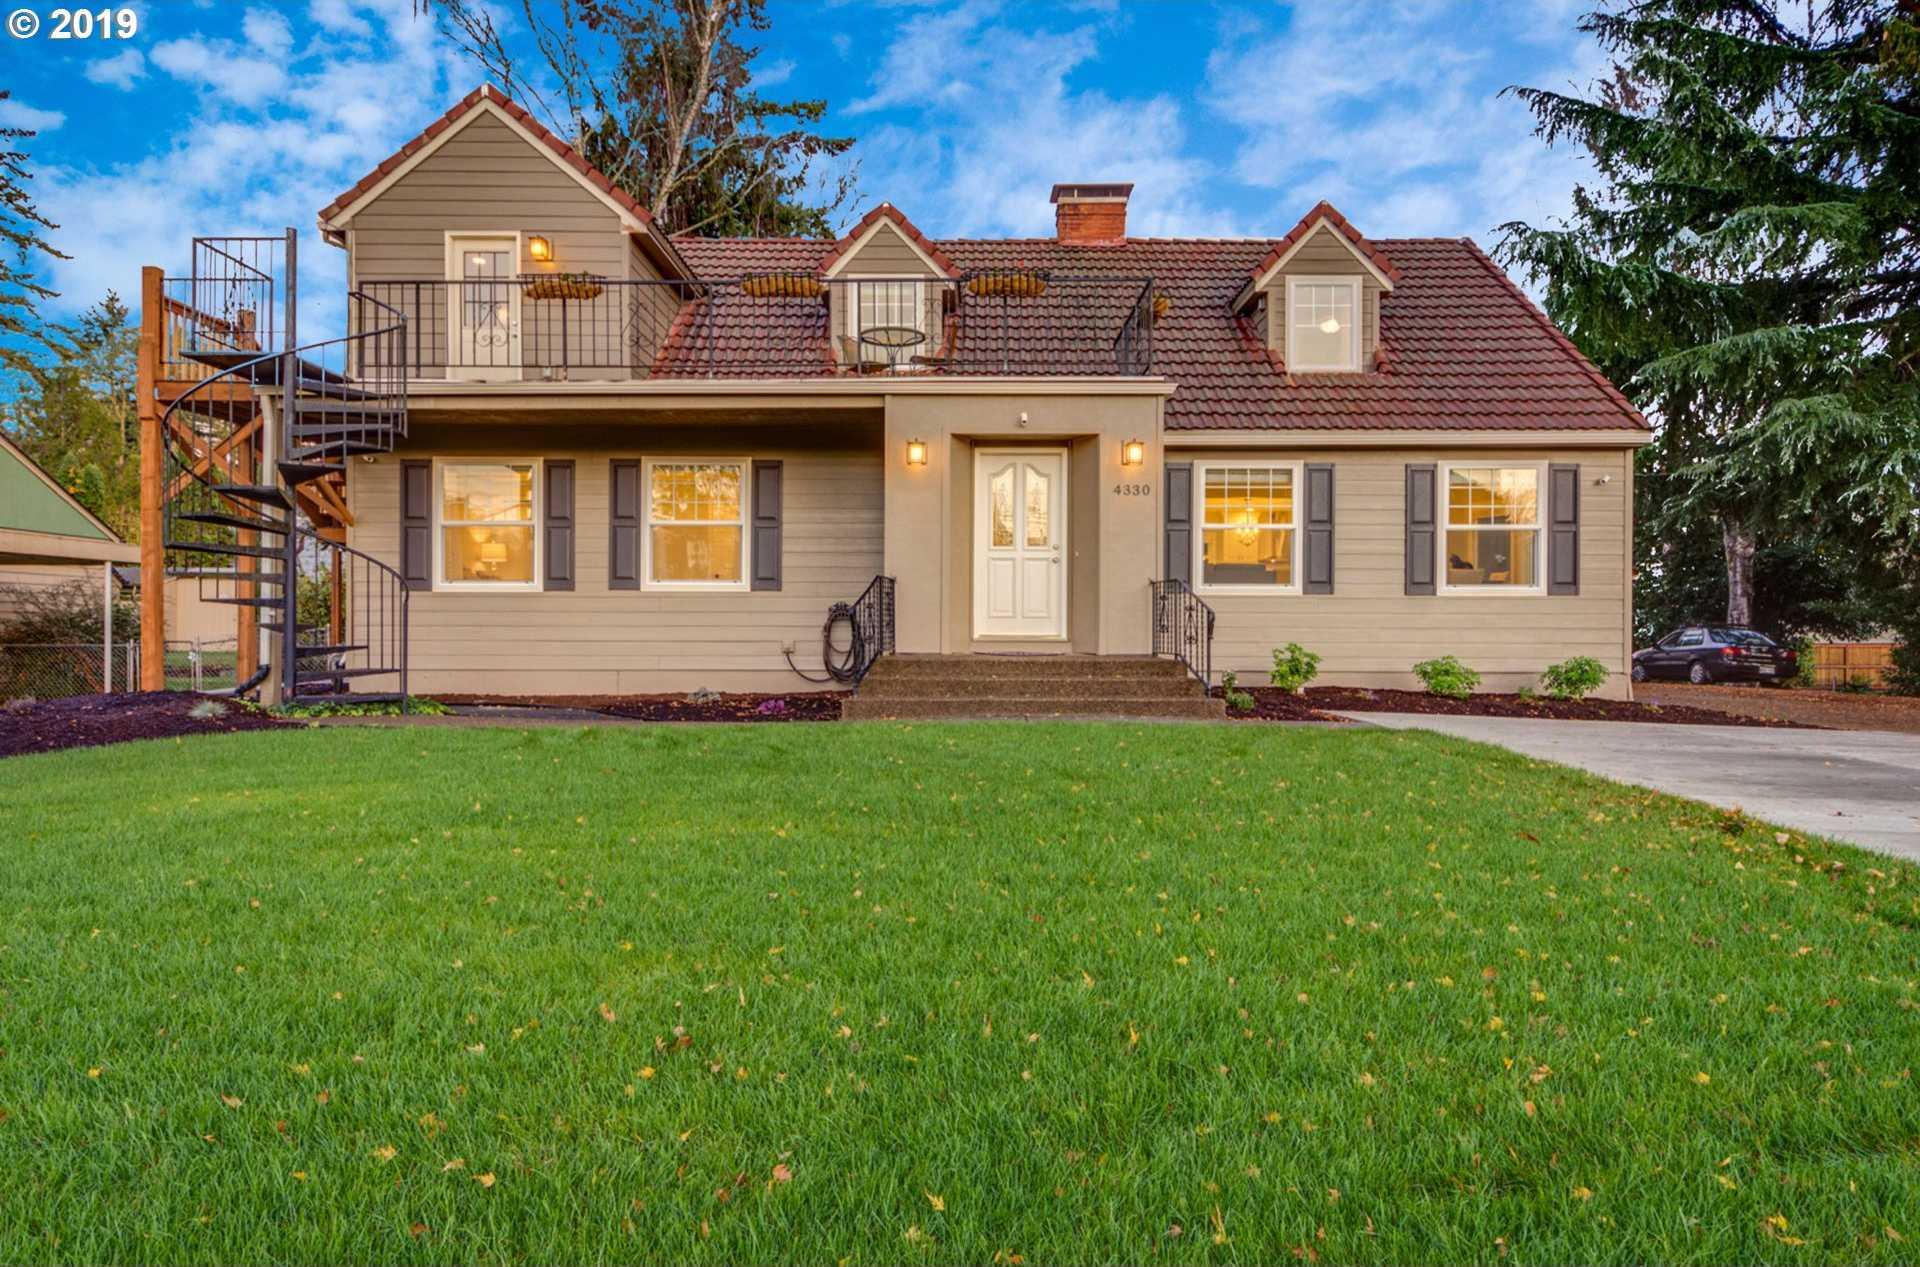 $859,000 - 5Br/5Ba -  for Sale in West Slope, Portland